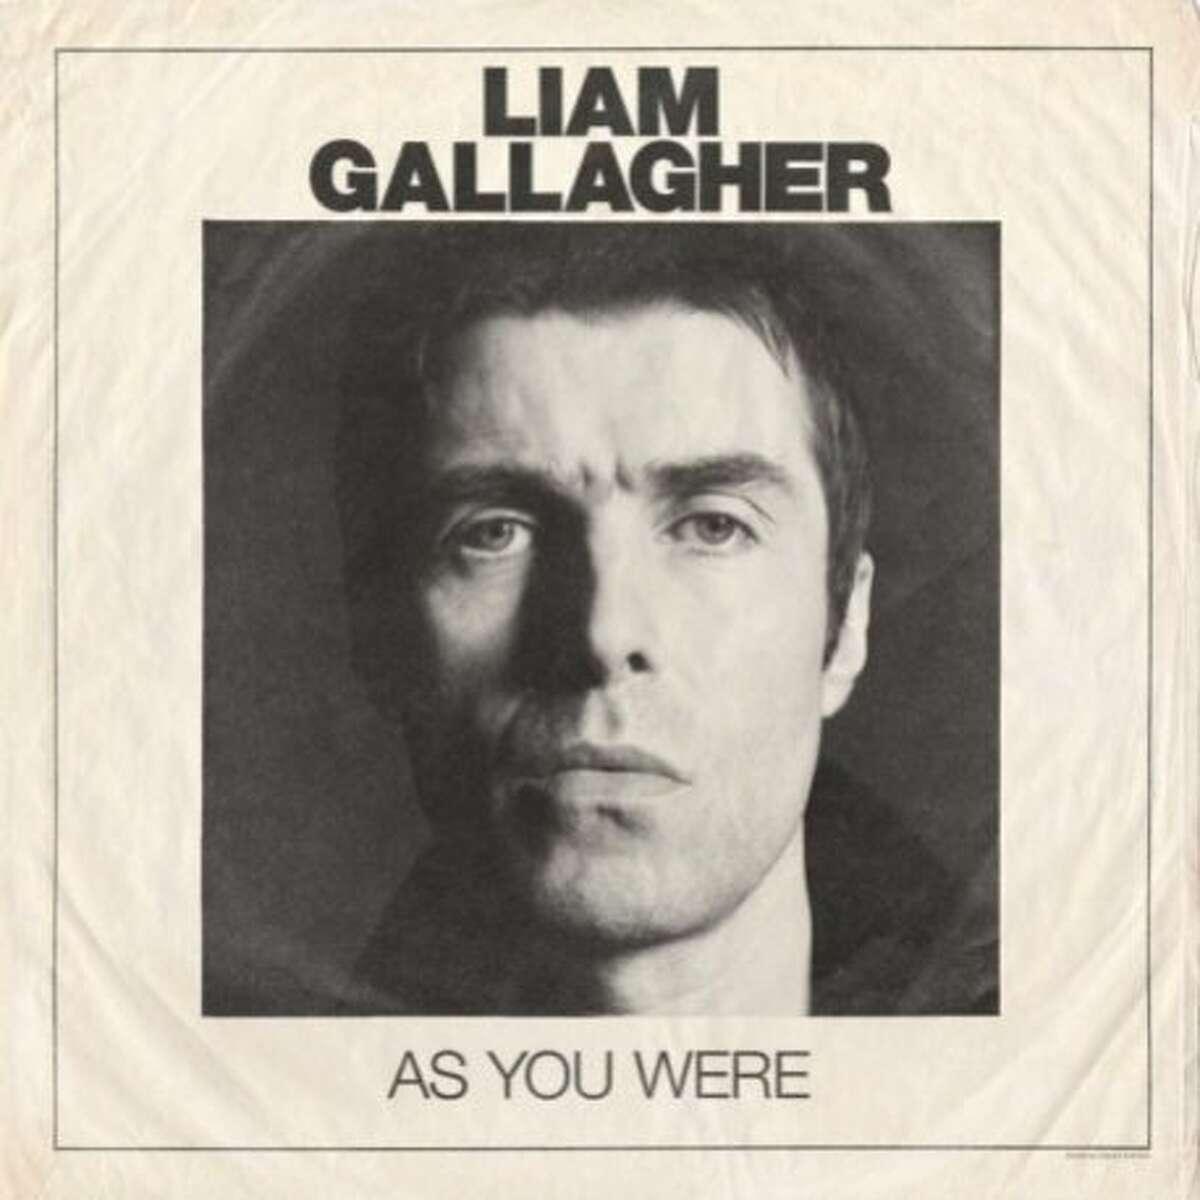 Liam Gallagher, 'As You Were'